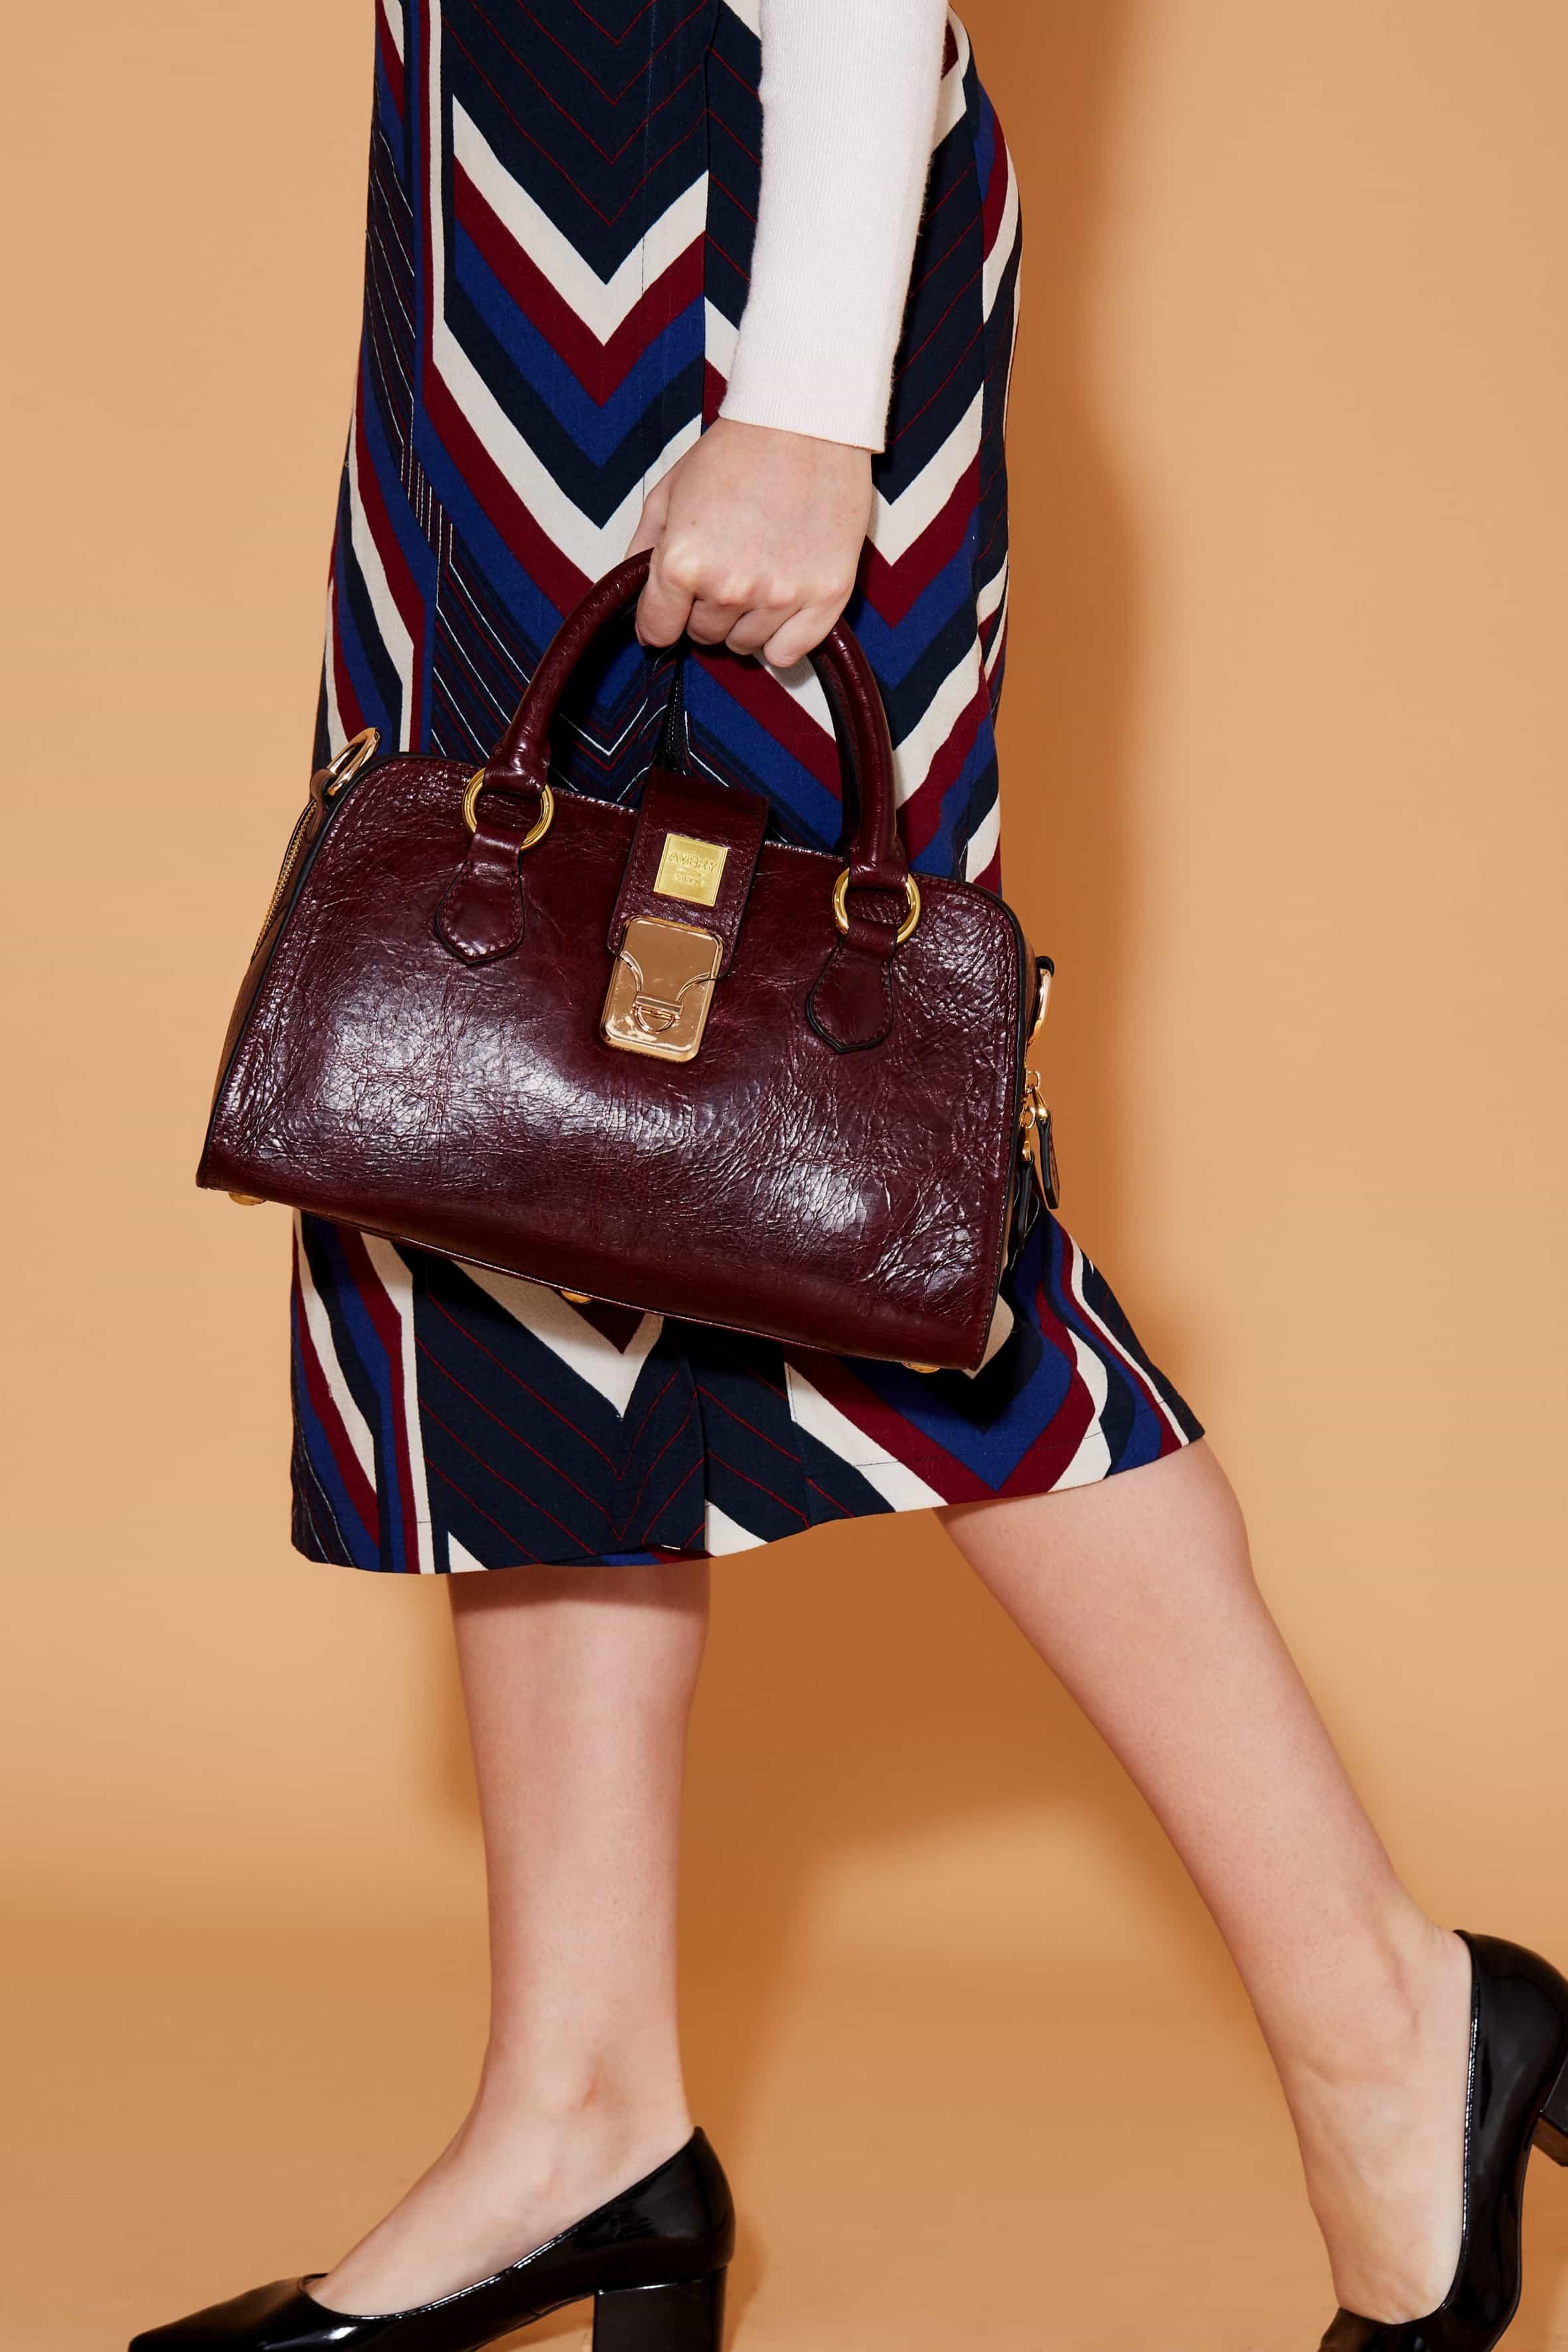 Avery Verse Handbag